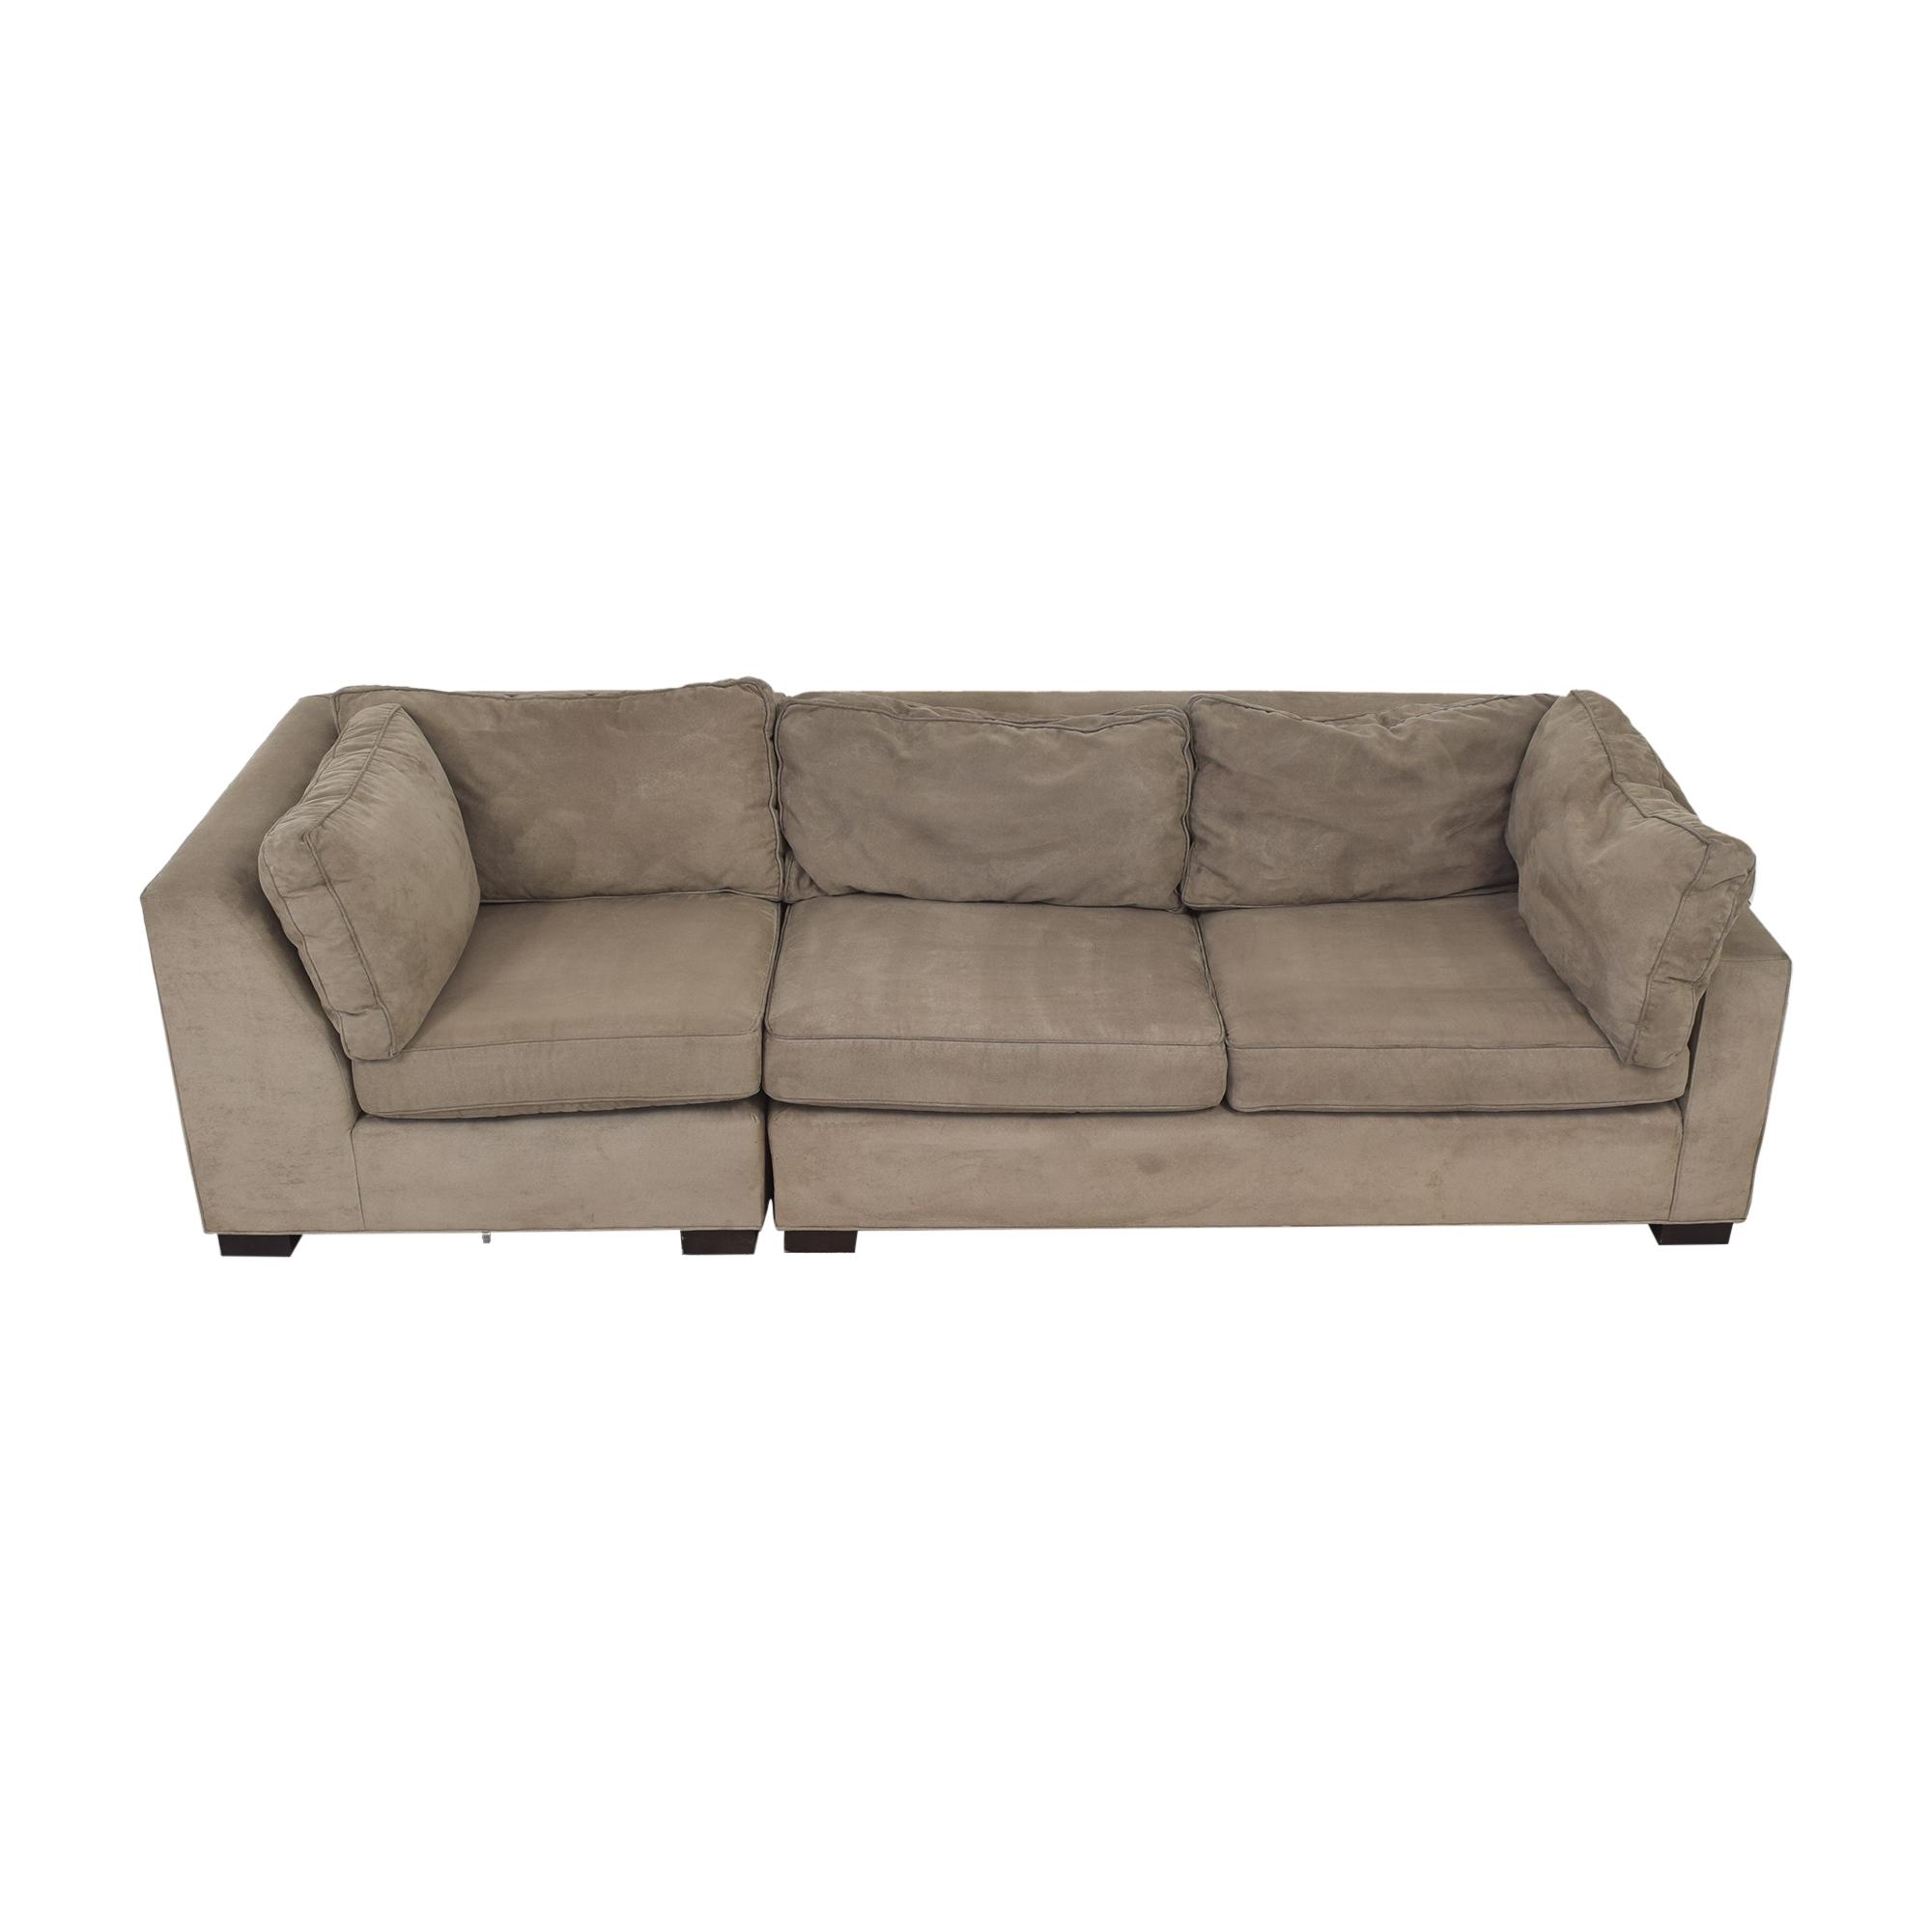 Mitchell Gold + Bob Williams Sectional Sofa / Sofas